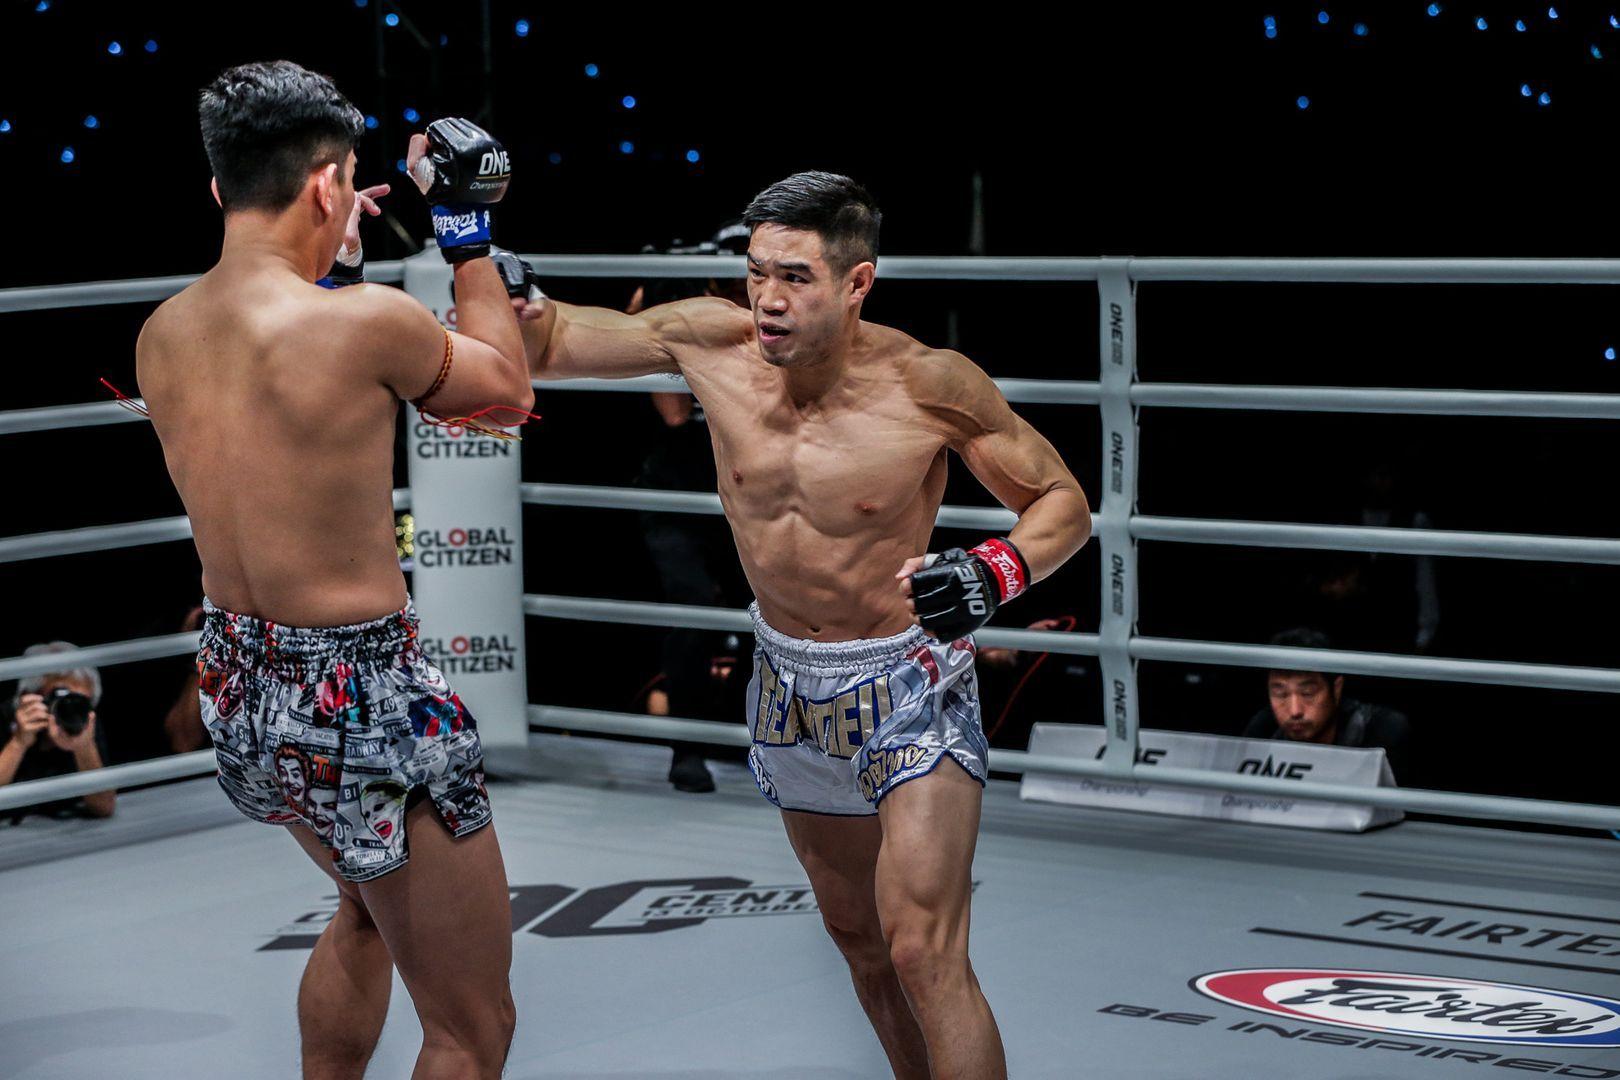 Michael Pham vs. Mohamad Fakri Bin Yusoff ONE: IMMORTAL TRIUMPH